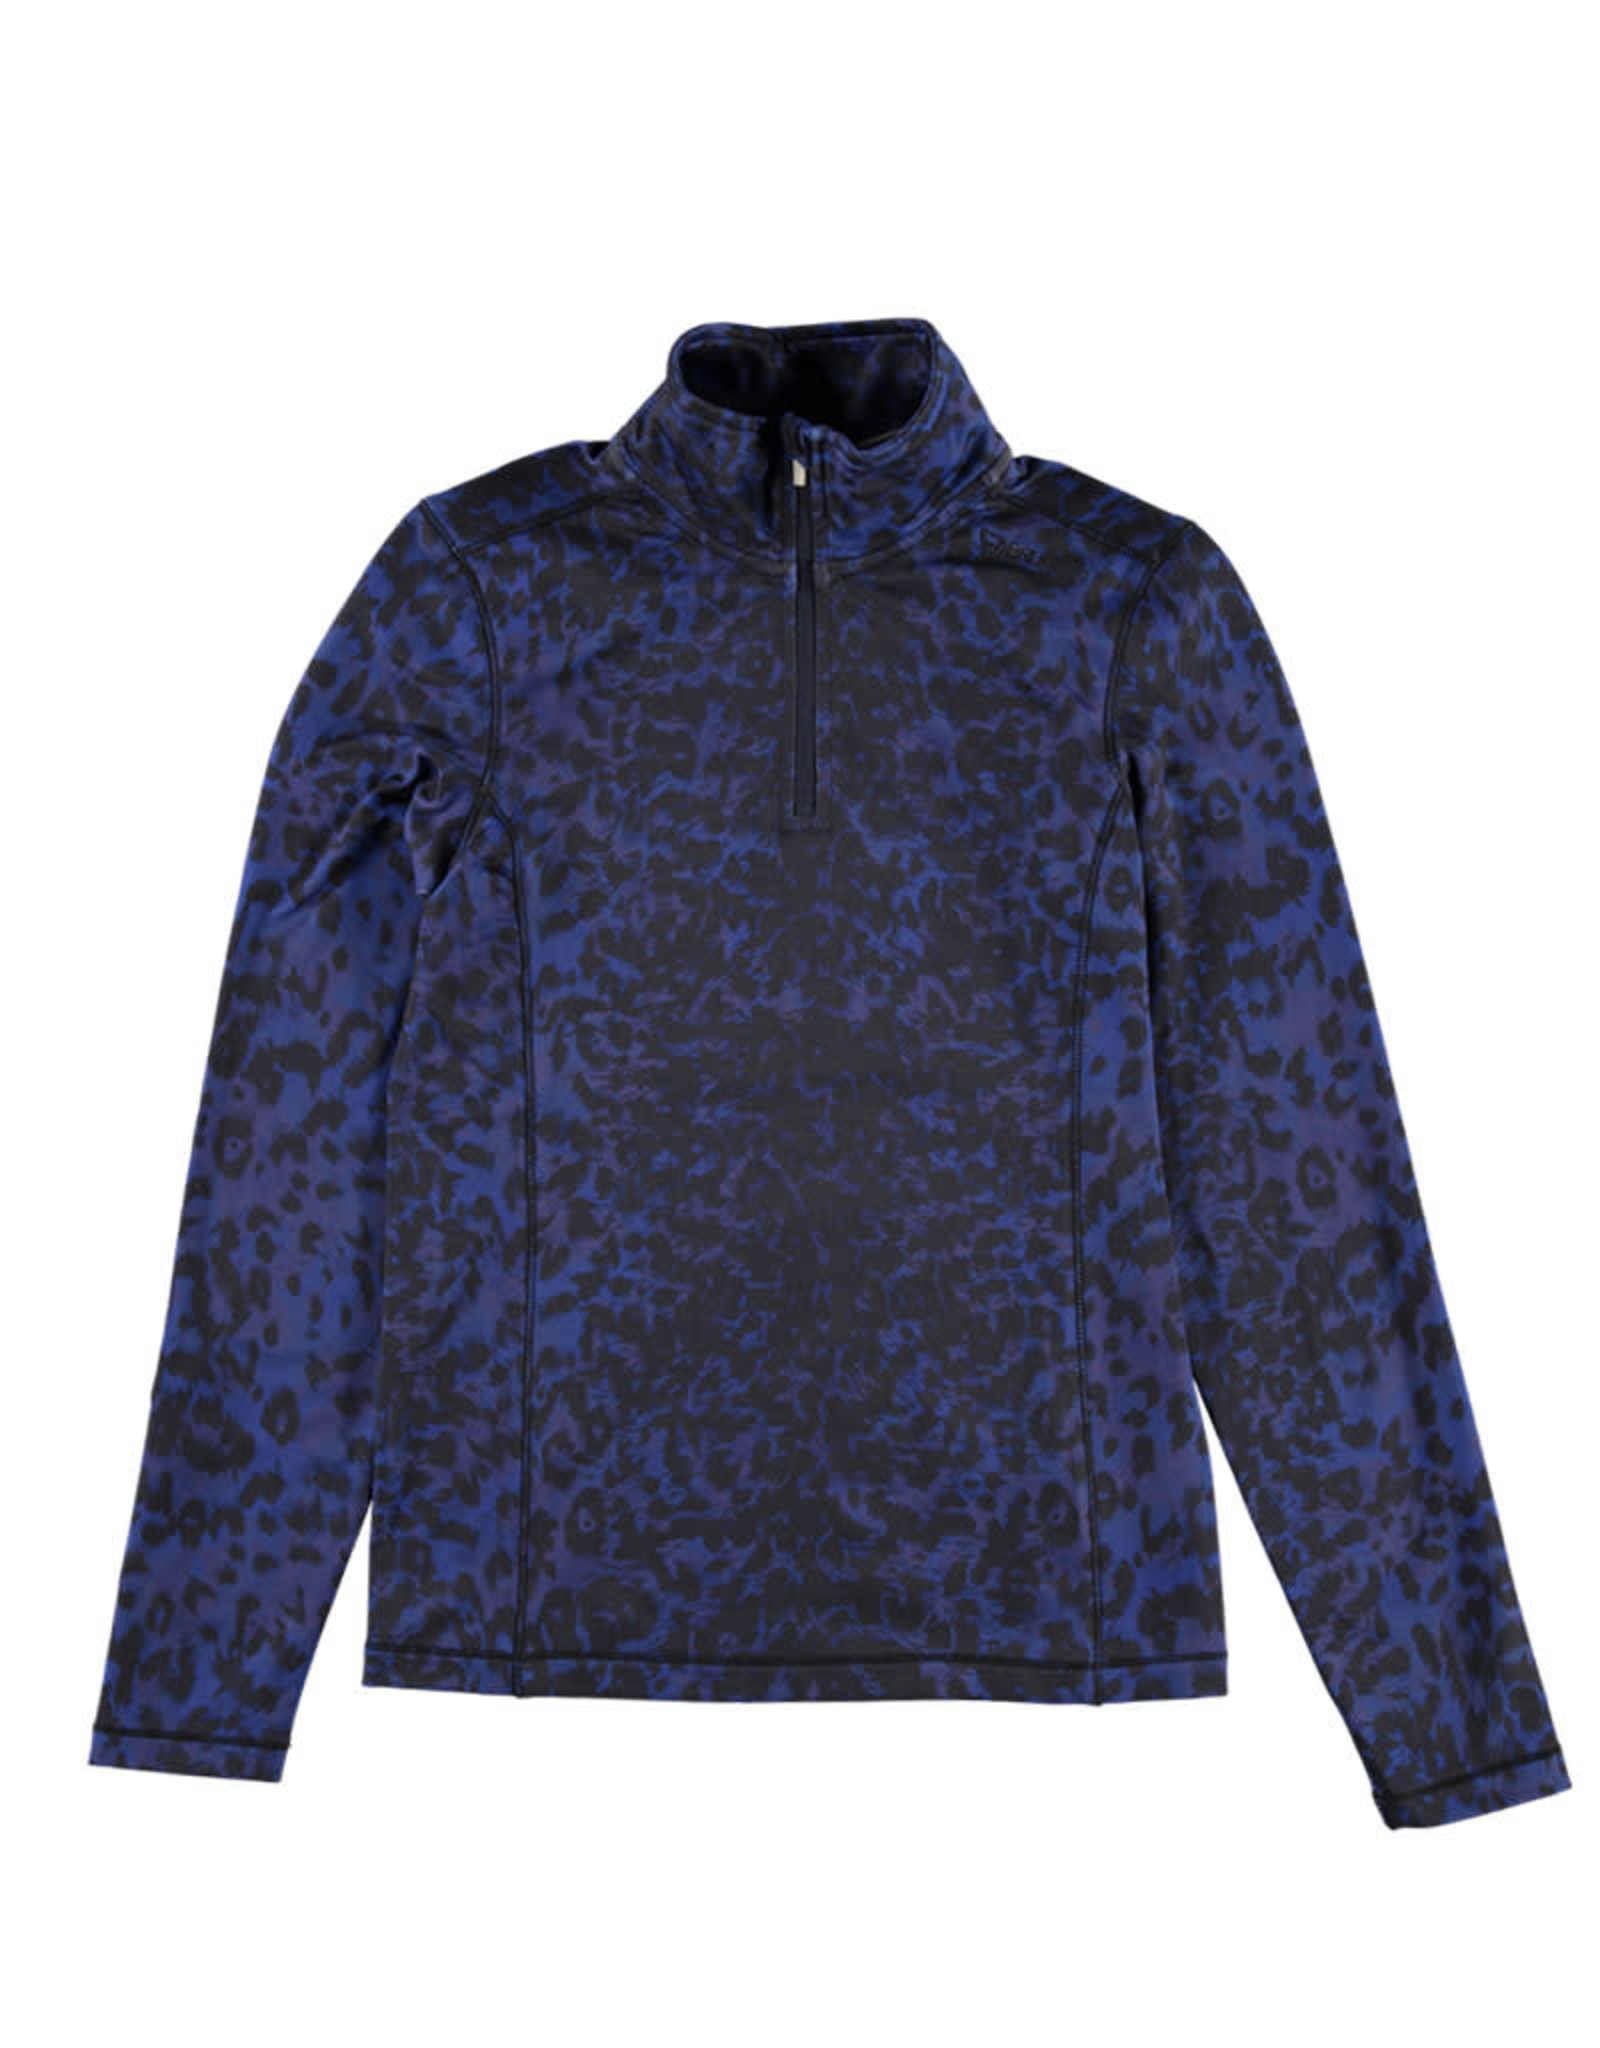 BRUNOTTI BRUNOTTI AQUILLY Fleece Night Blue 152